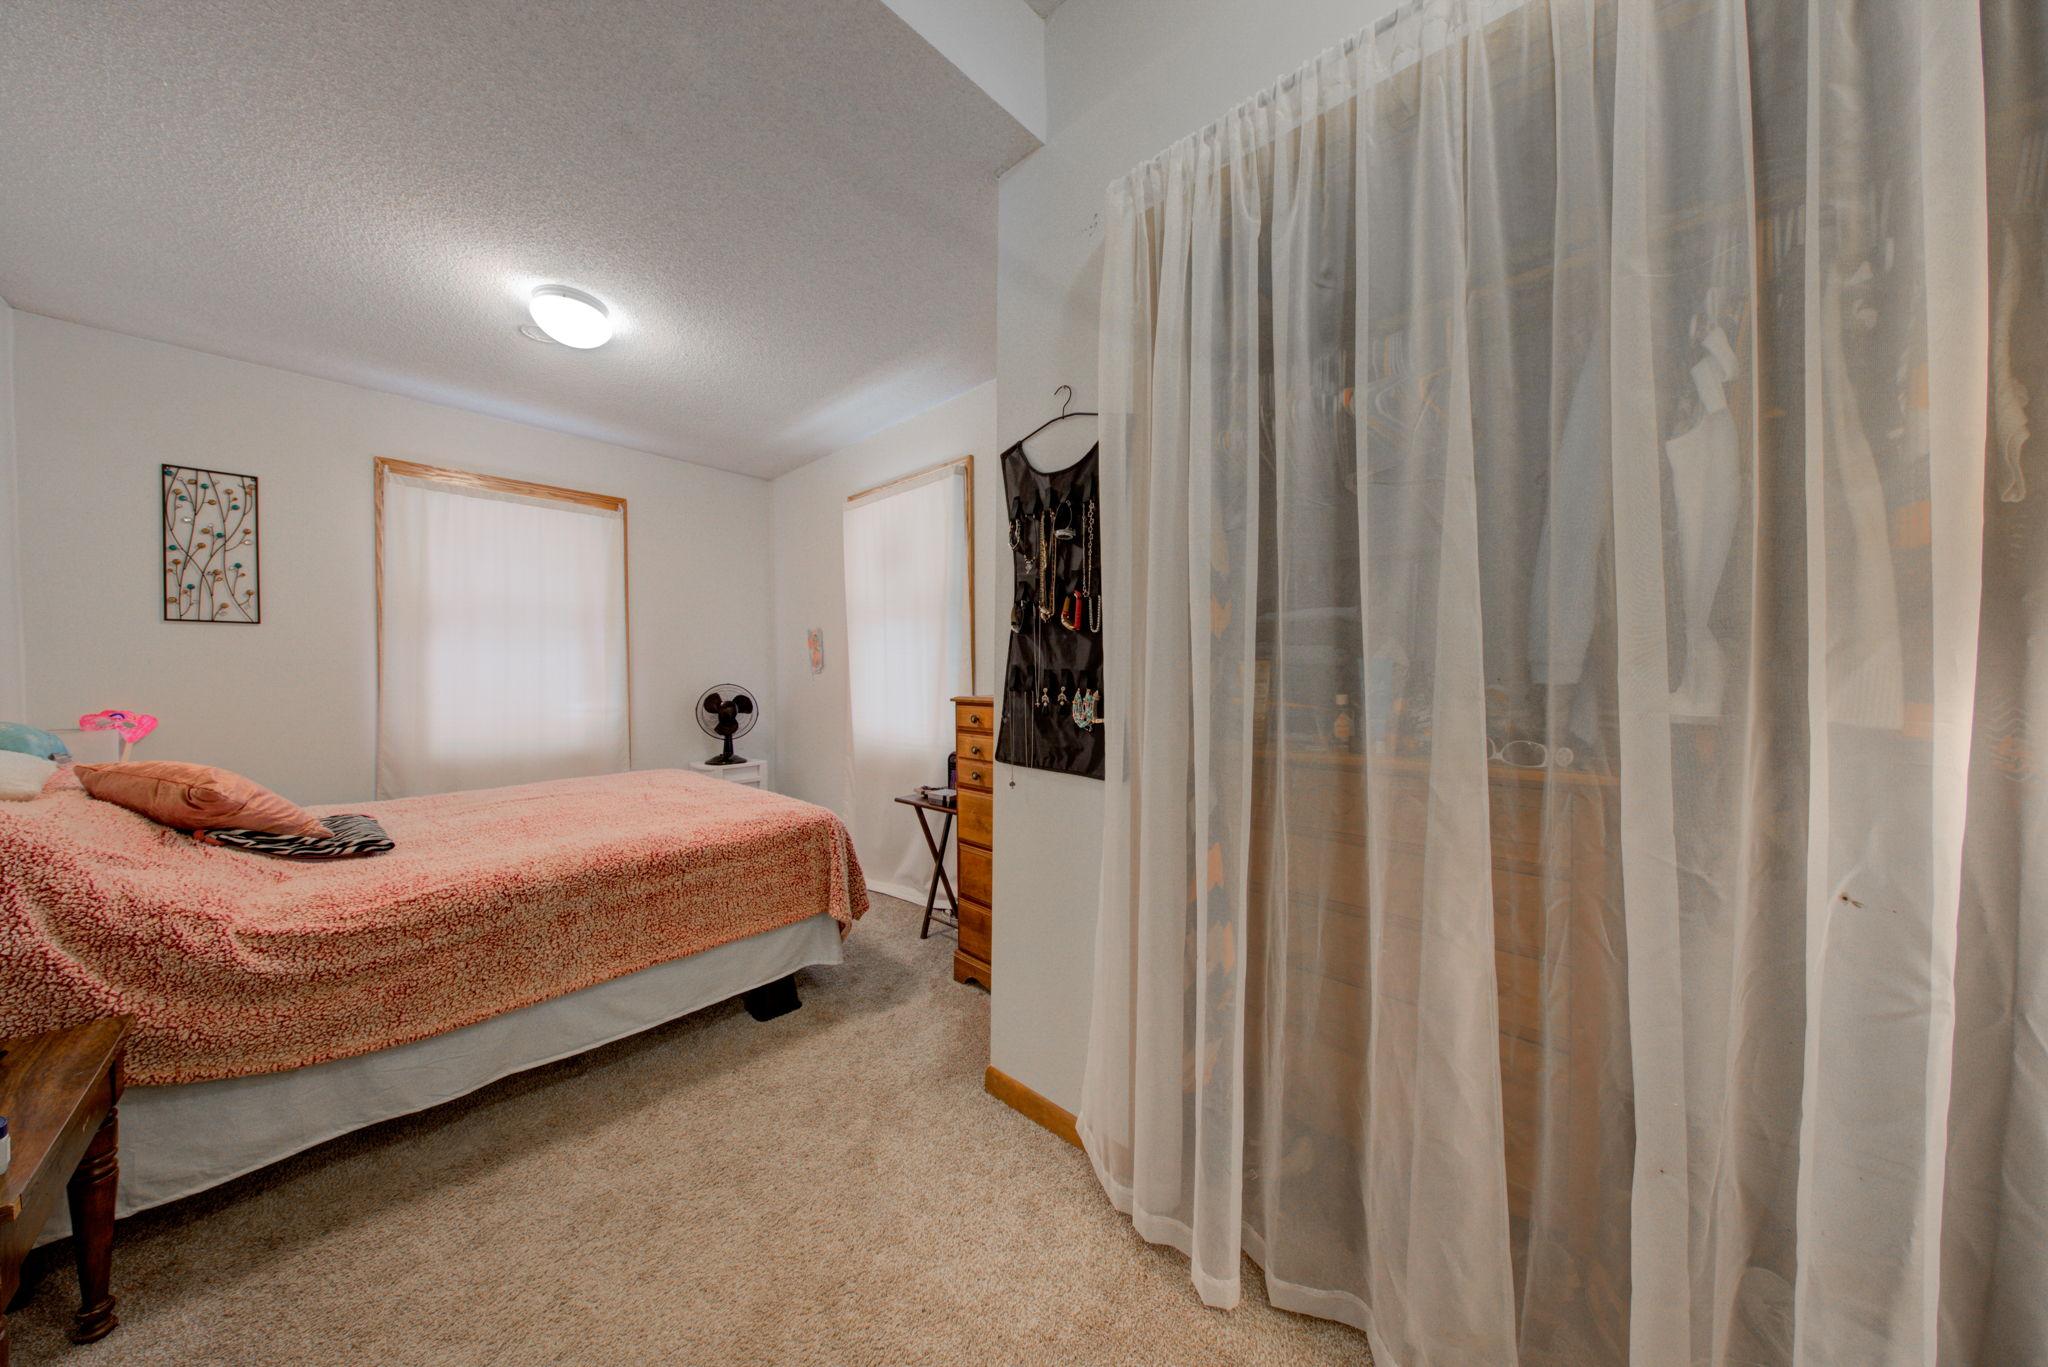 Unit 1 Master Bedroom